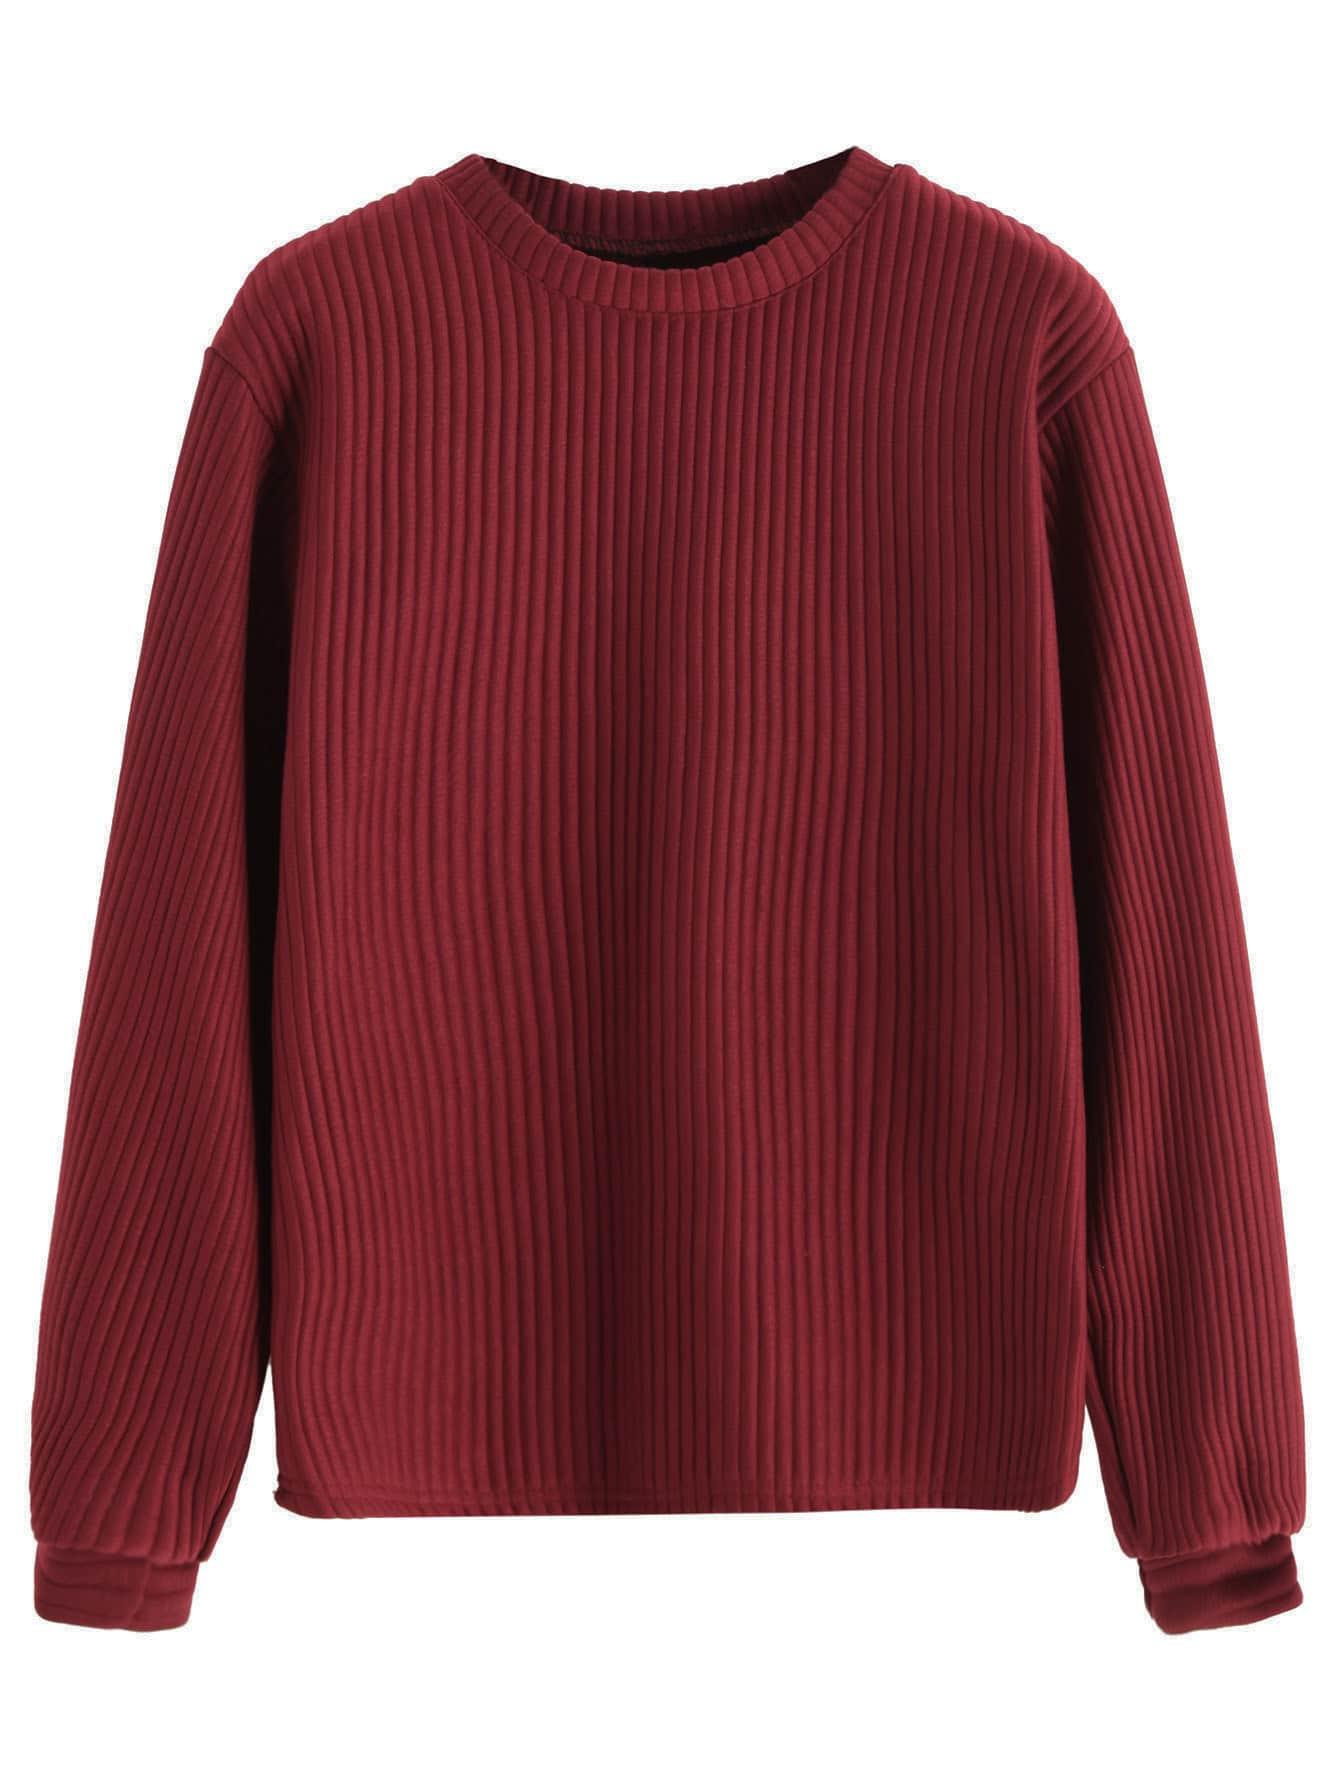 Burgundy Long Sleeve Ribbed Sweatshirt